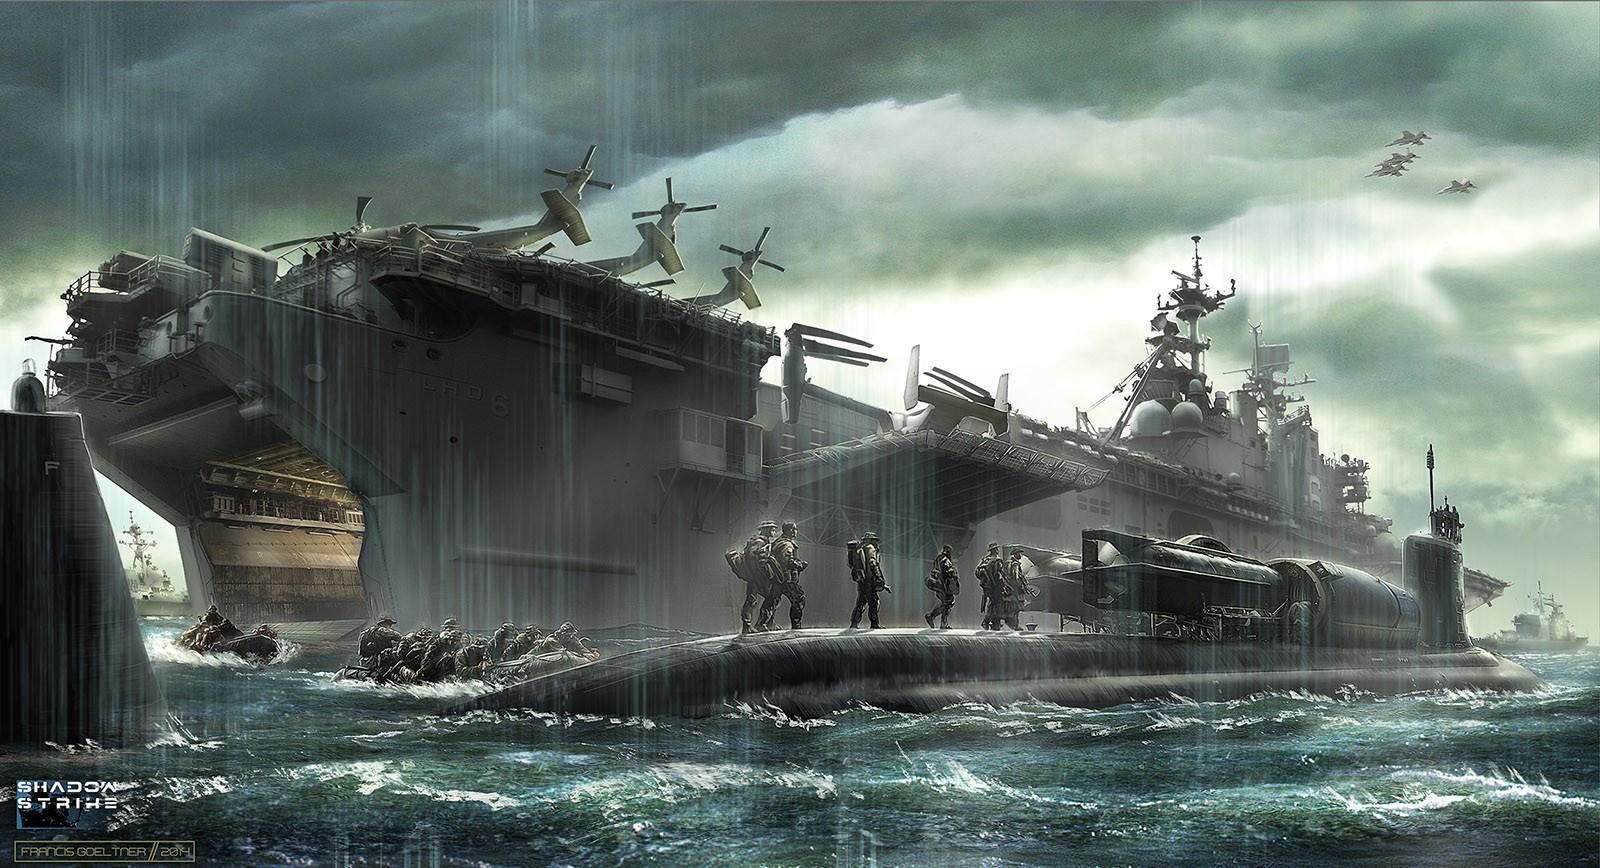 South China Sea - The Submarine